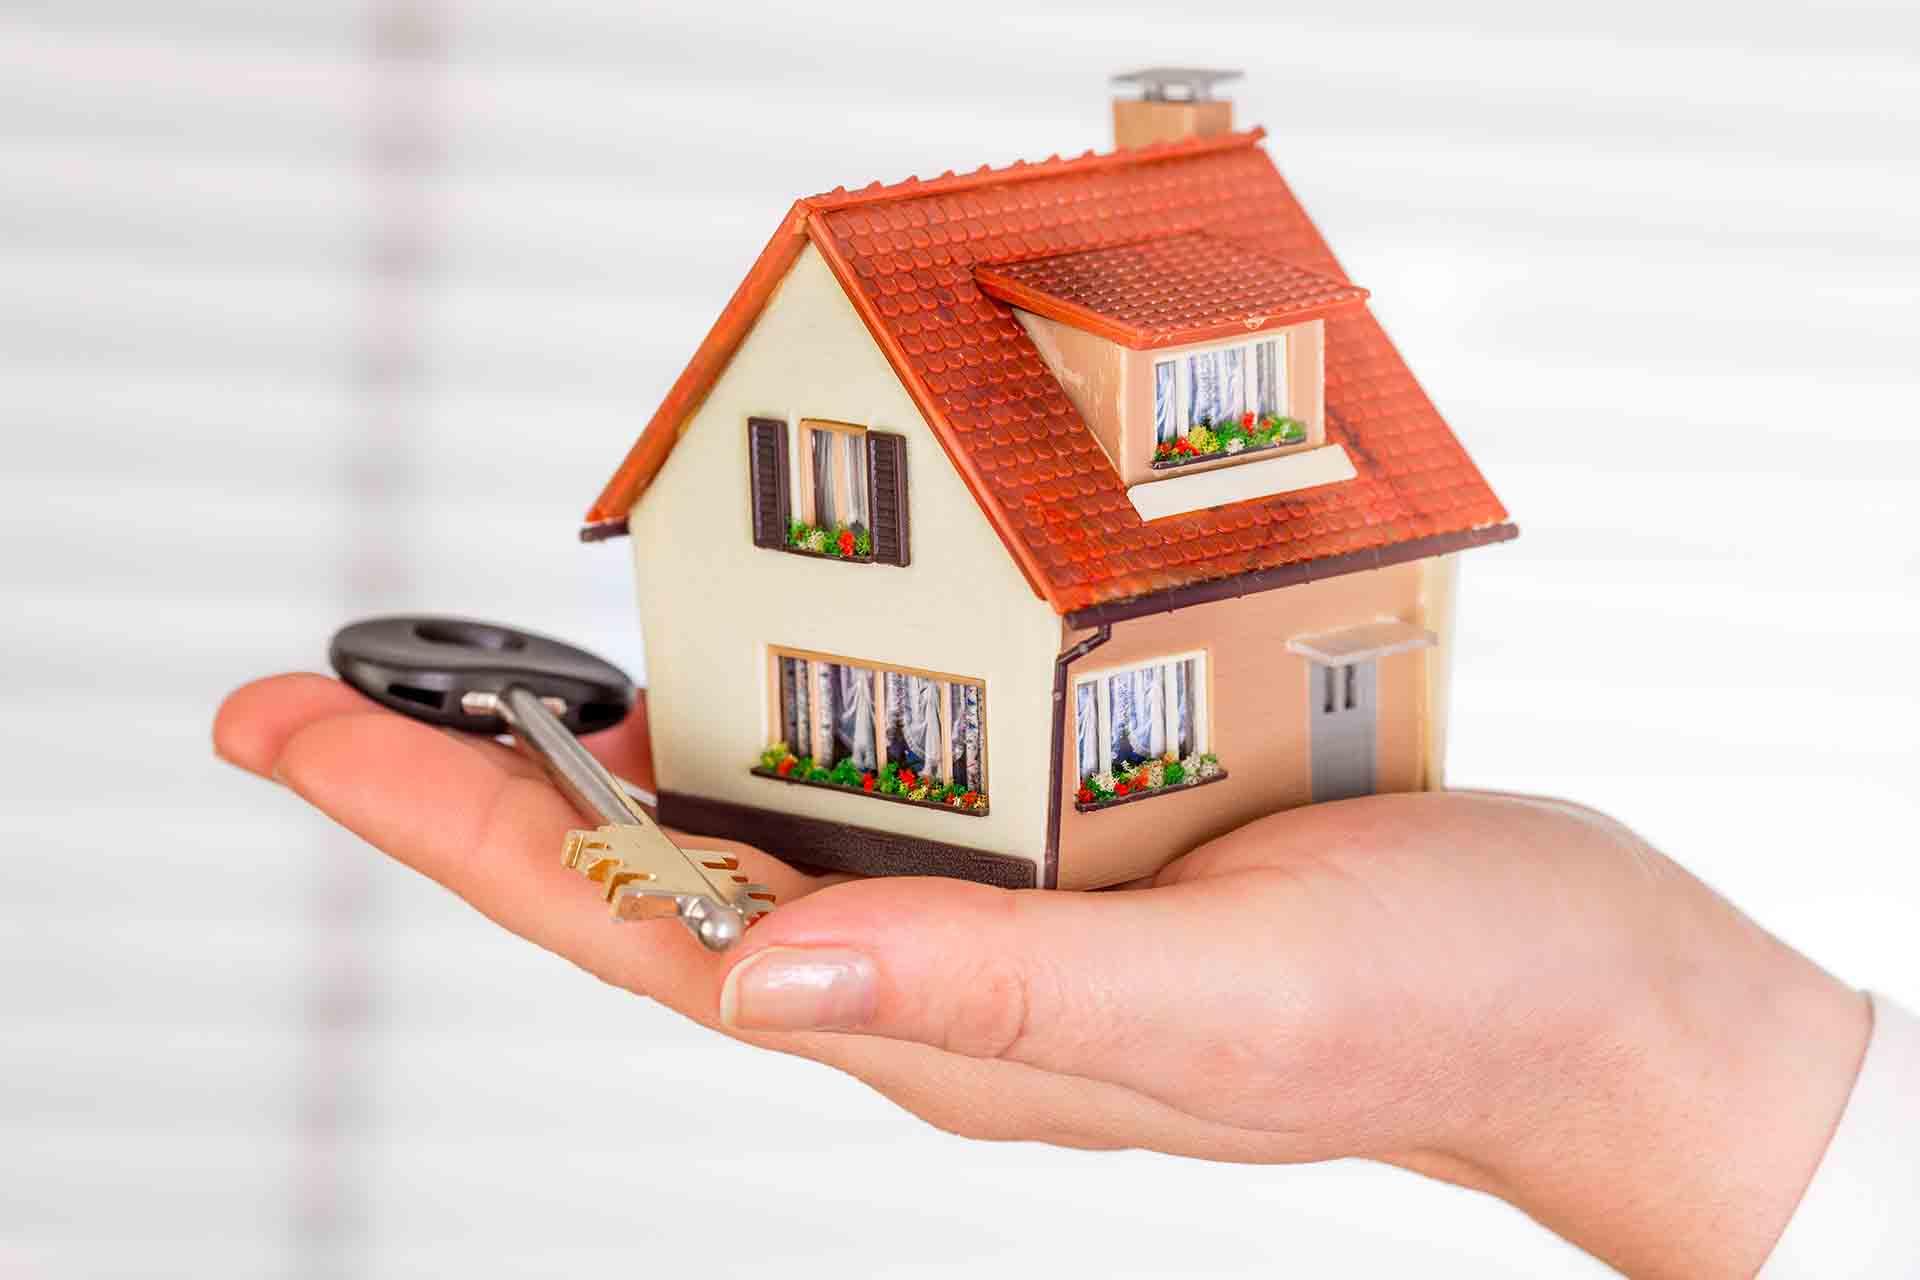 How Do I Prepare My House for Listing?